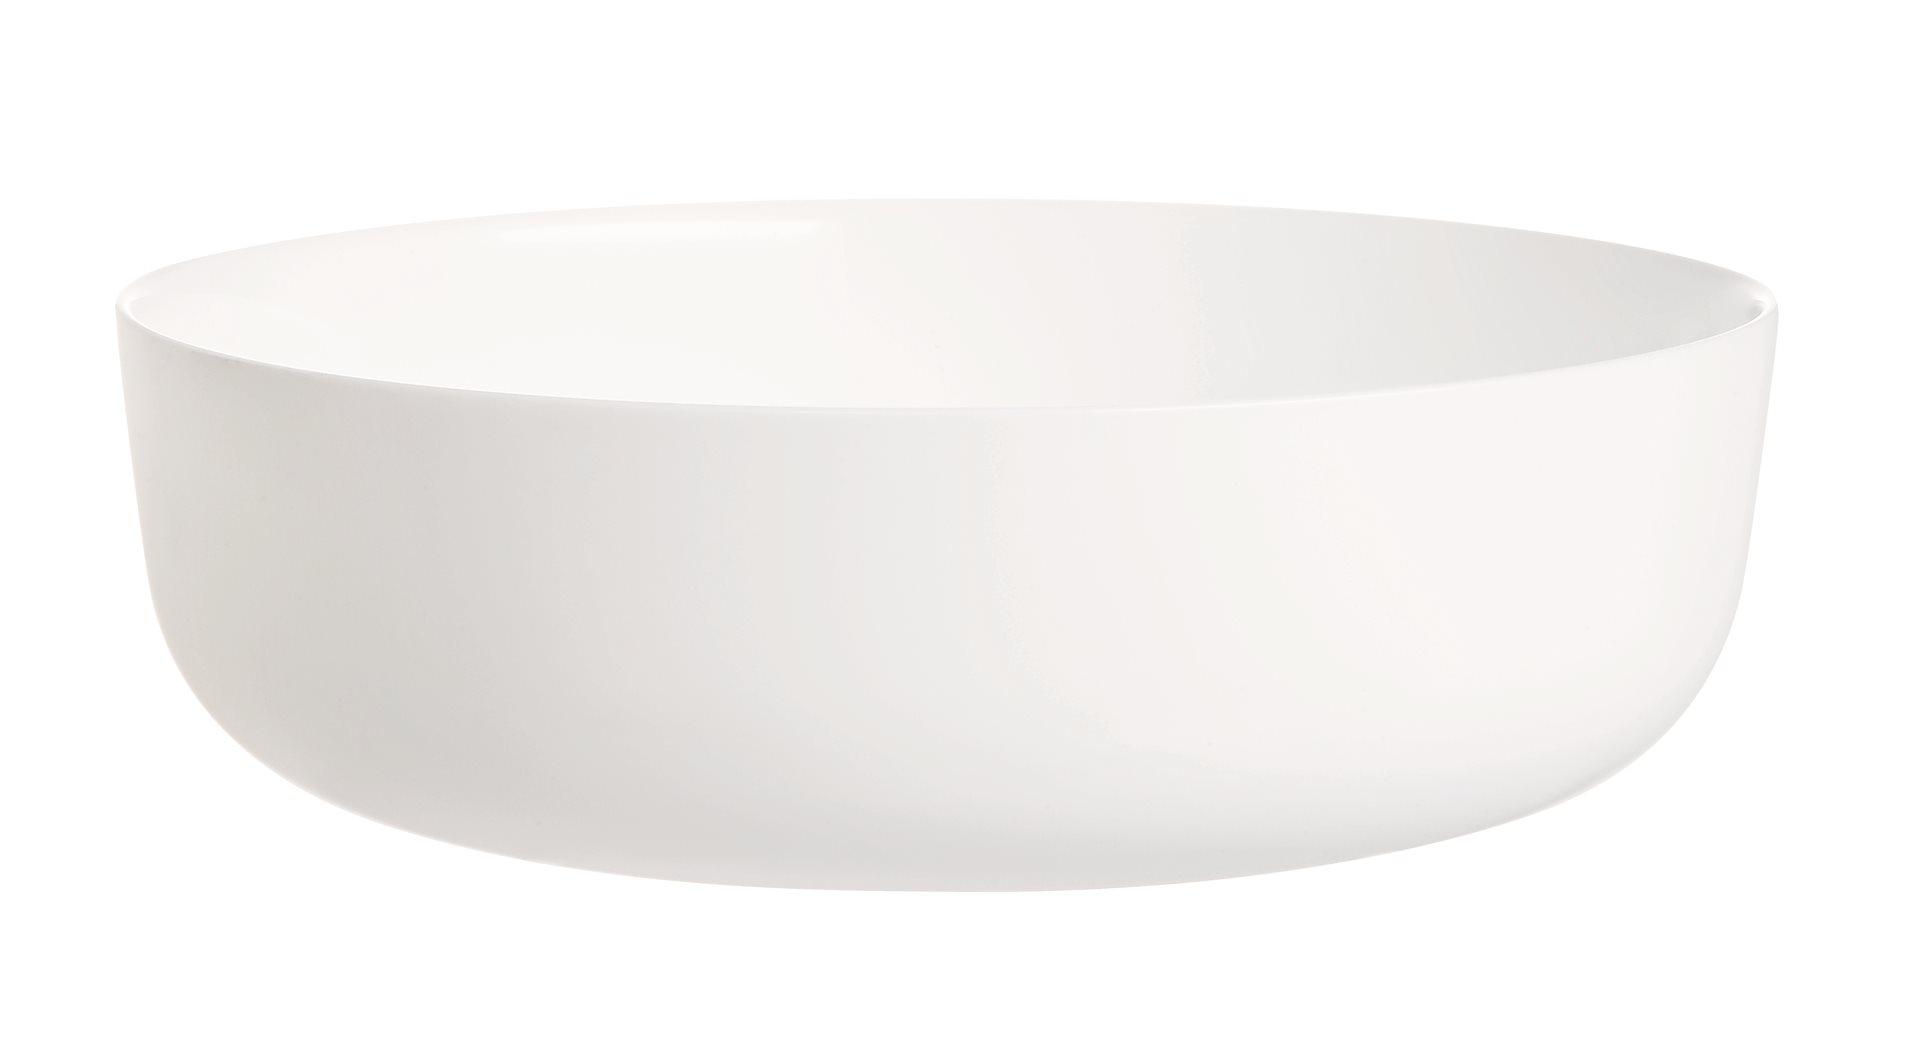 LUMINARC Πυρίμαχο Σκεύος Πορσελάνης 22εκ., 2Lt. Λευκό Diwali - N3273